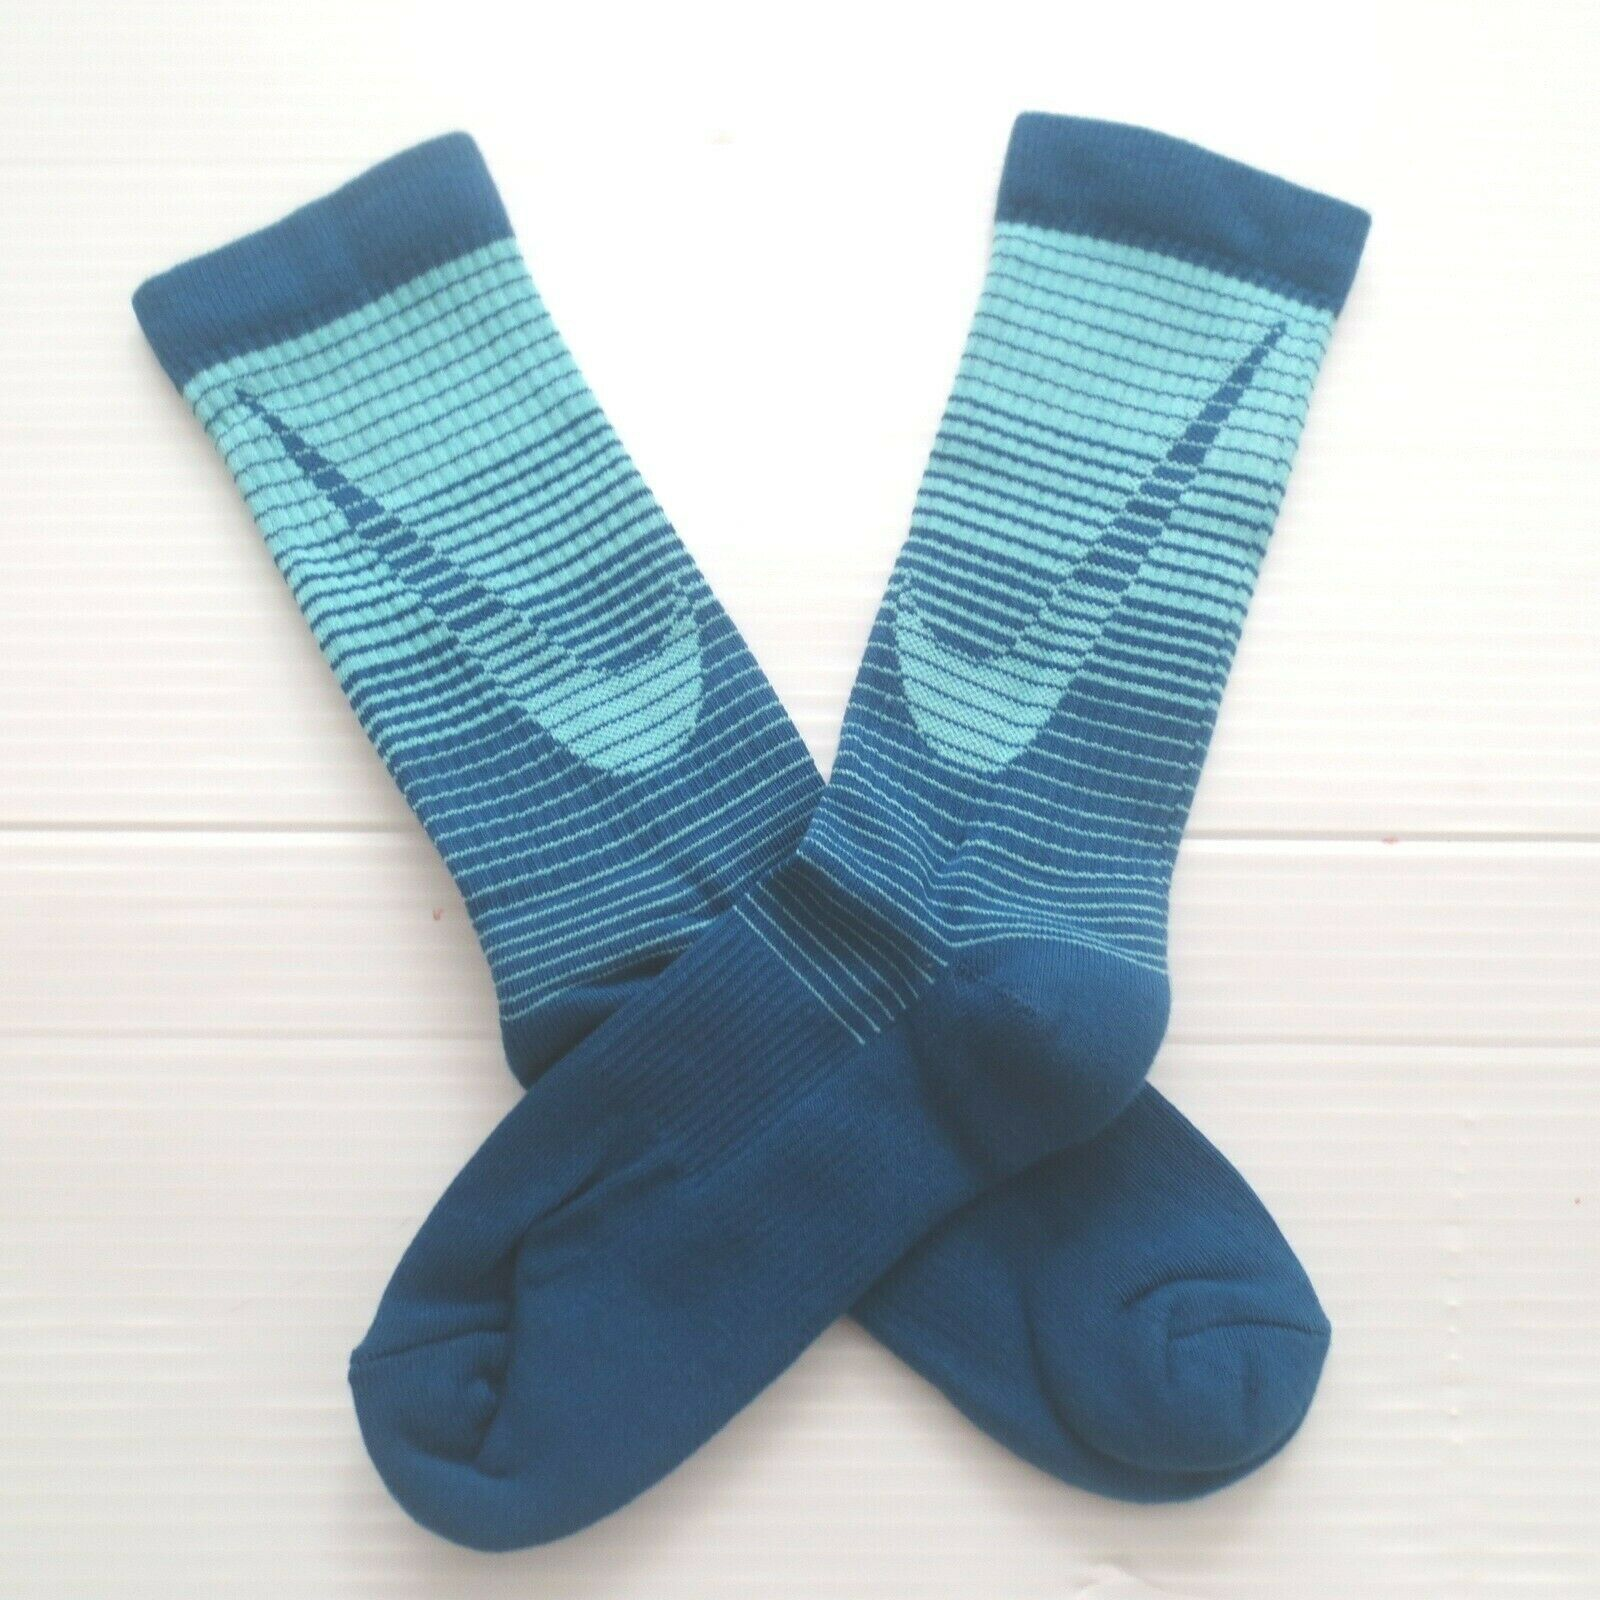 Nike Youth Performance Crew Socks - SX5816 - Dark Blue - Size M - NEW